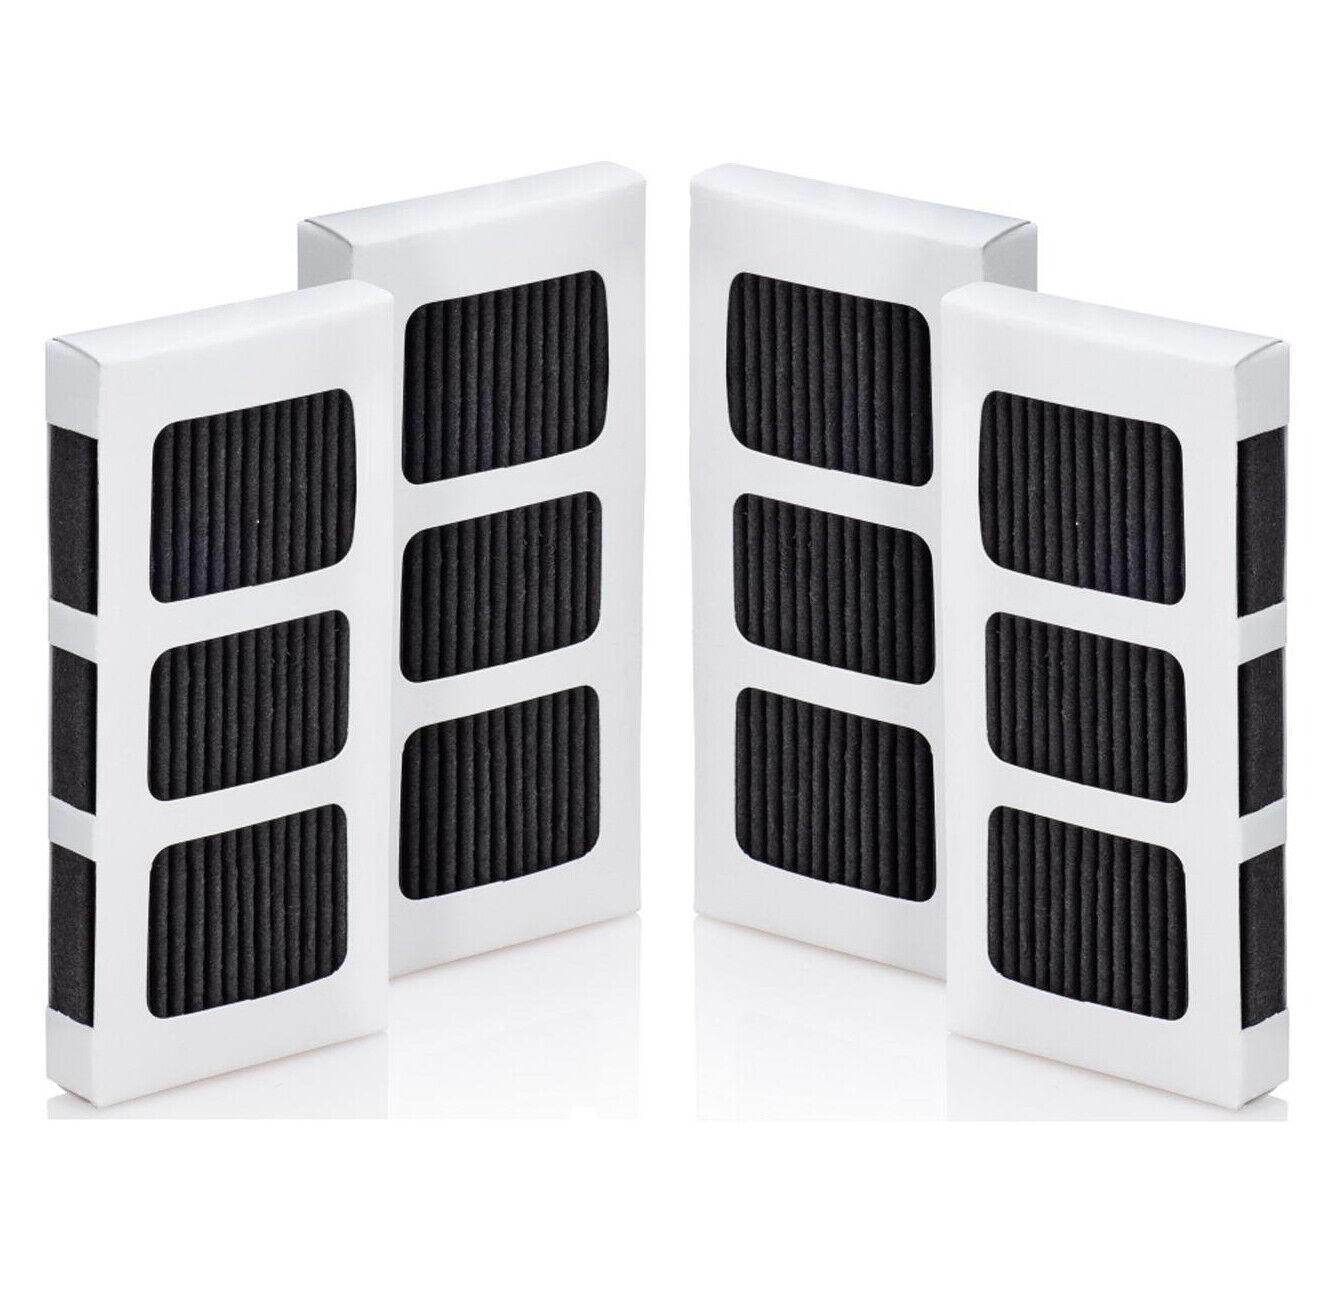 Frigidaire PAULTRA2 Refrigerator Air Filter PureAir Ultra II (4 pack)